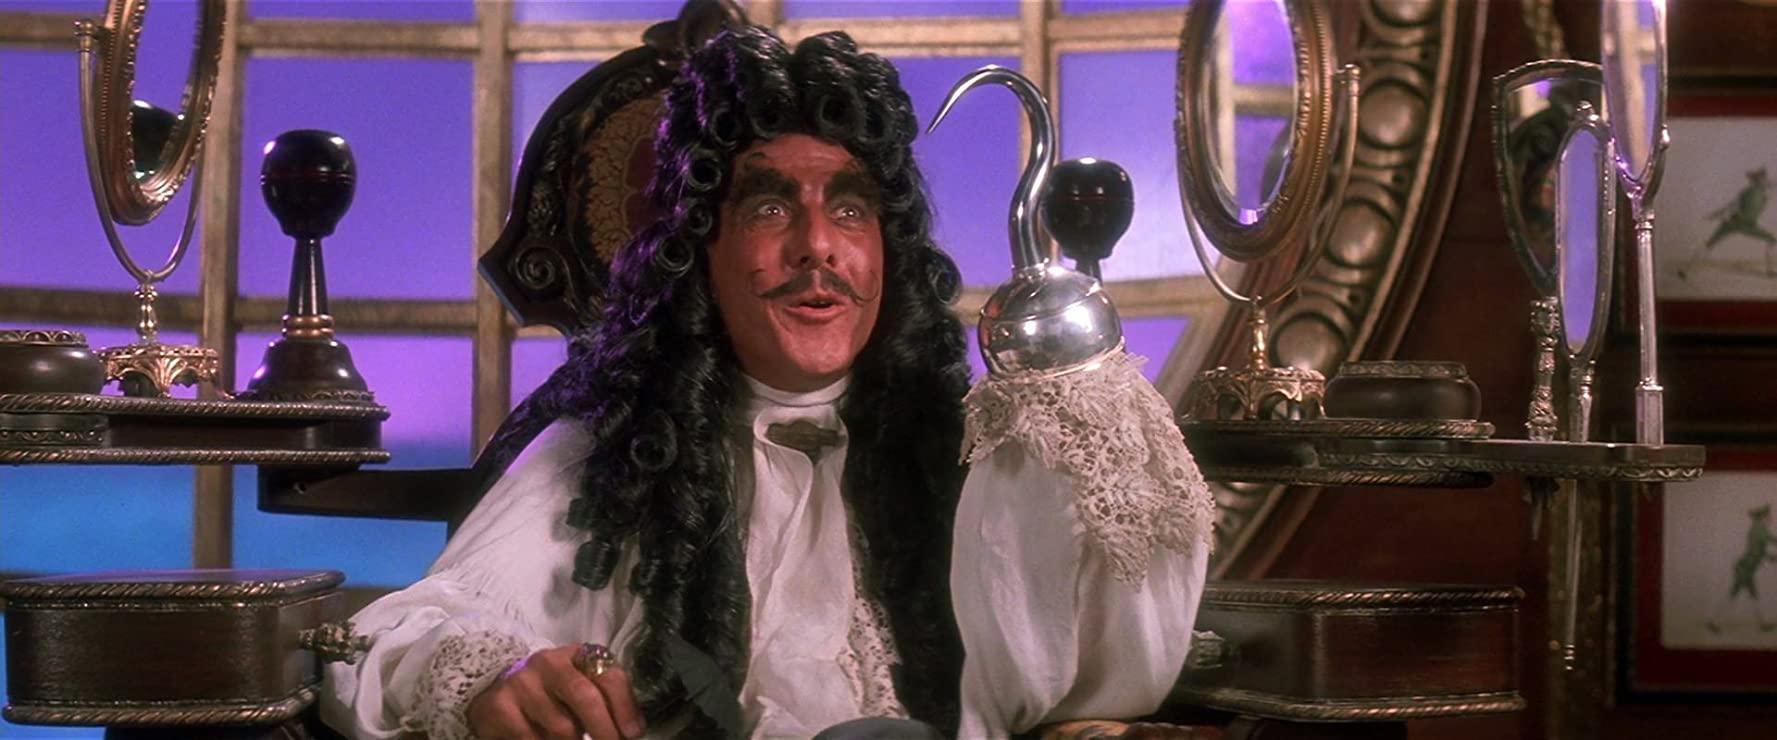 Dustin Hoffman in Hook 1991